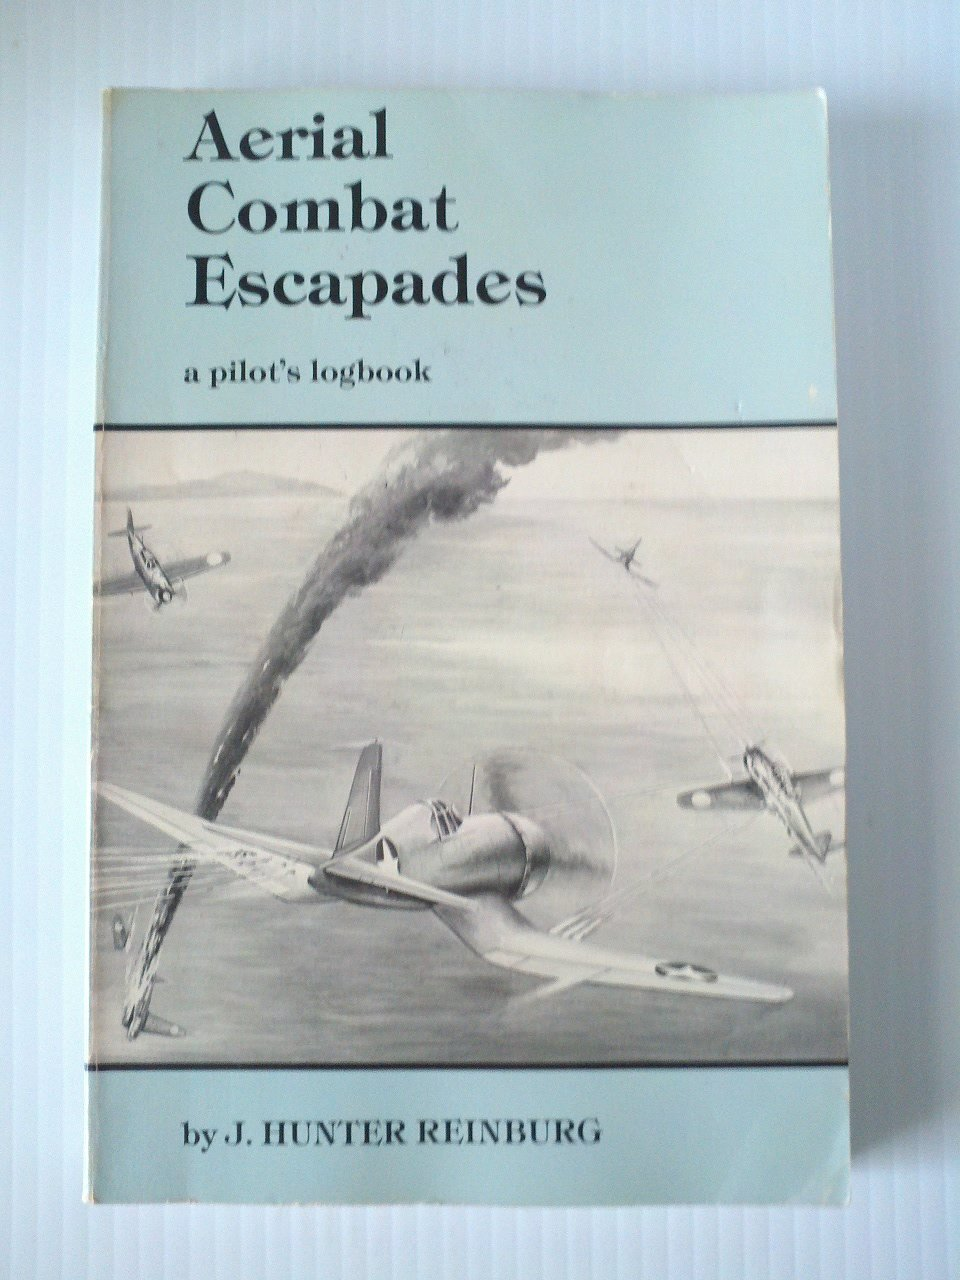 Aerial Combat Escapades: A Pilot's Logbook: The True Combat Aerial Adventures of an American Fighter Pilot